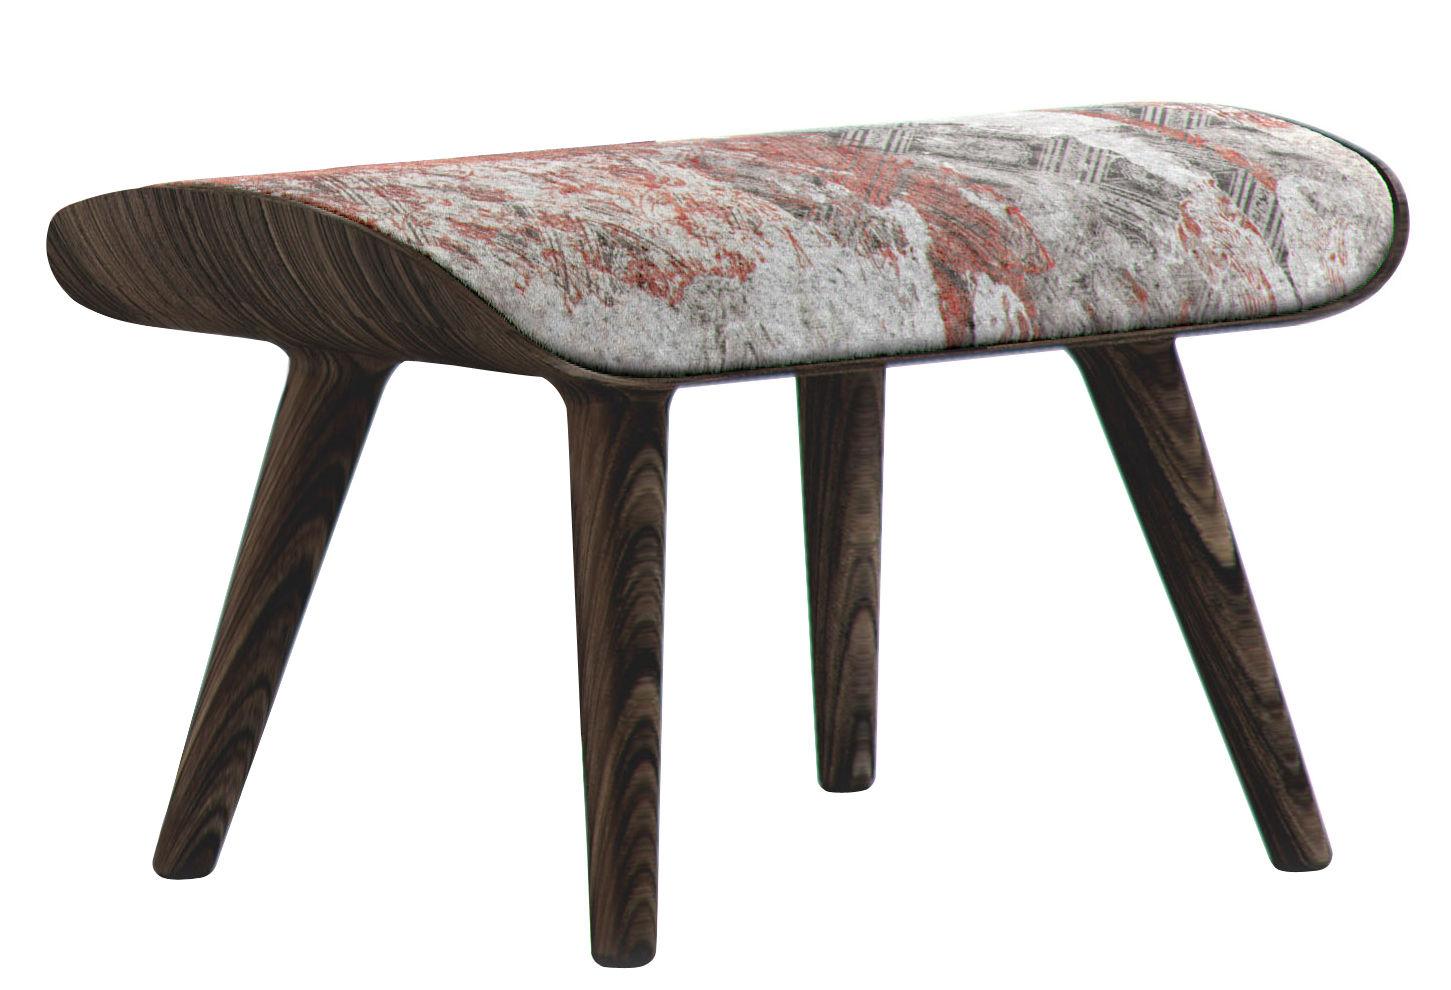 pouf nut repose pieds tons rouges structure bois cannelle moooi. Black Bedroom Furniture Sets. Home Design Ideas